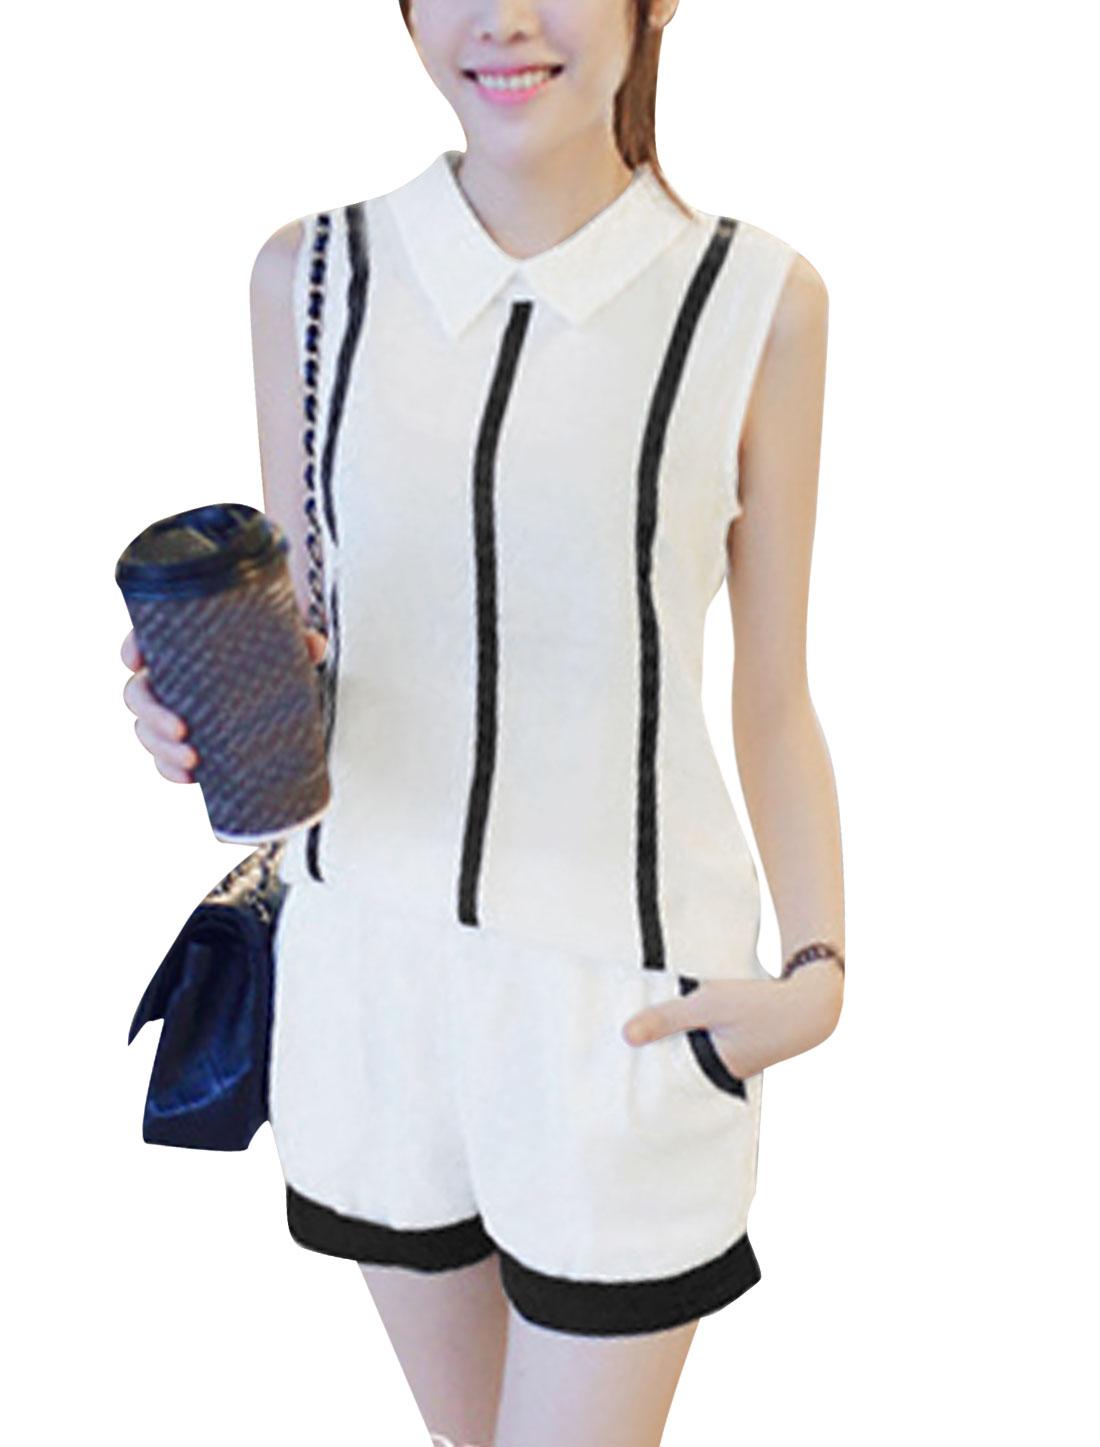 Lady Elastic Waist Shorts w Zip Fly Back Stripes Semi Sheer Top White XS